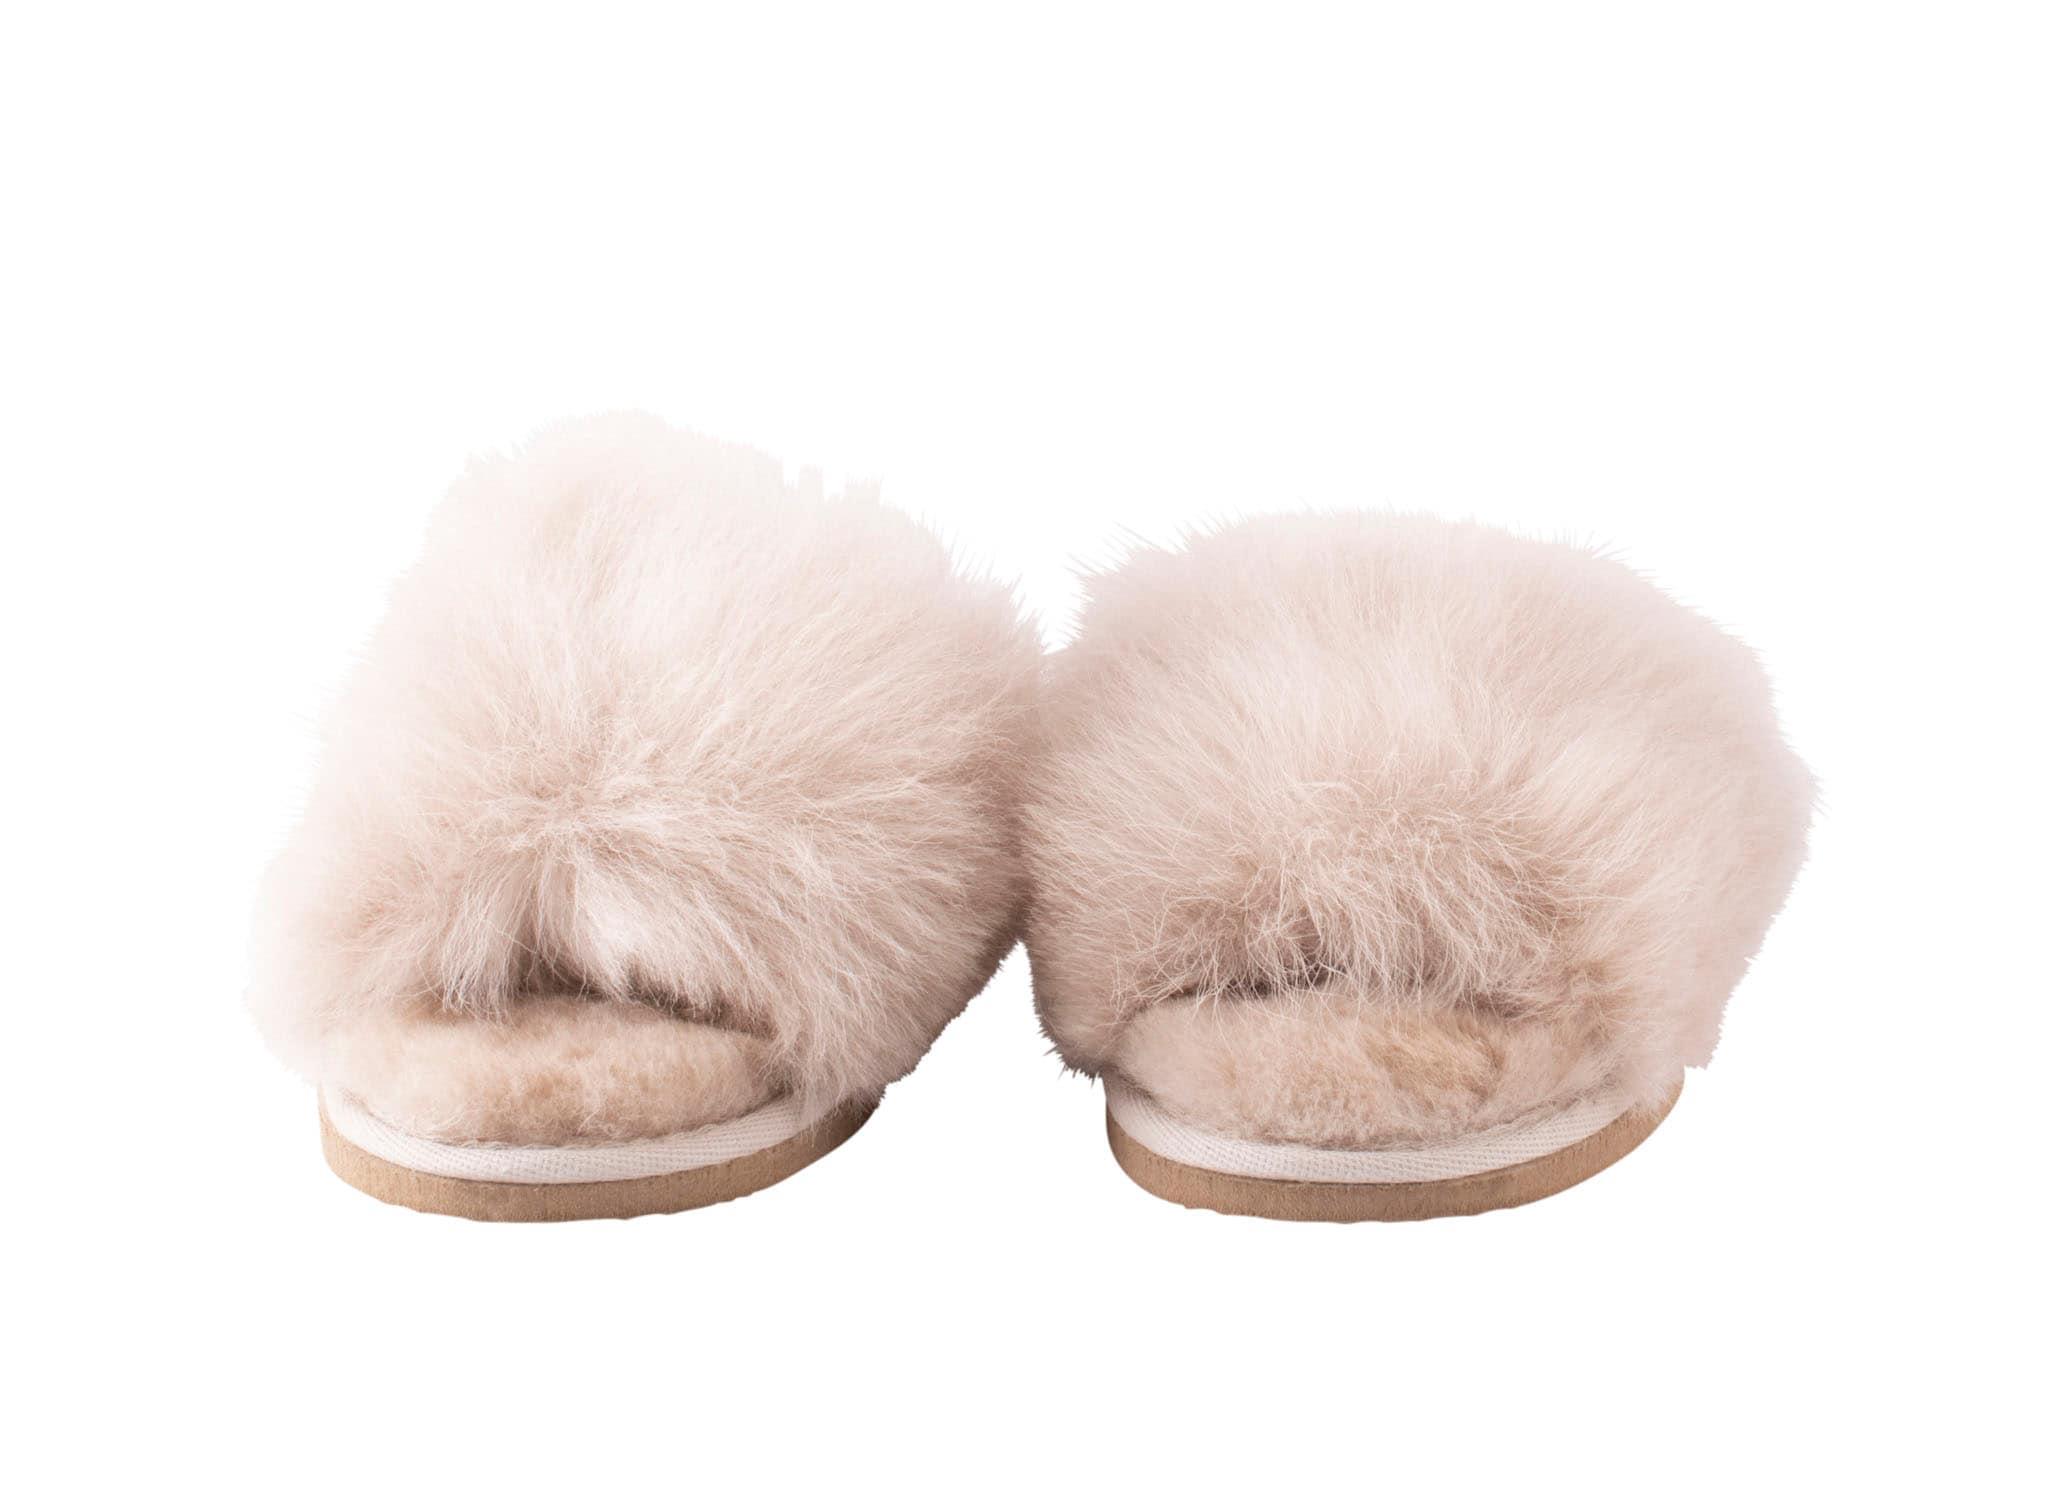 Tessan sheepskin slippers